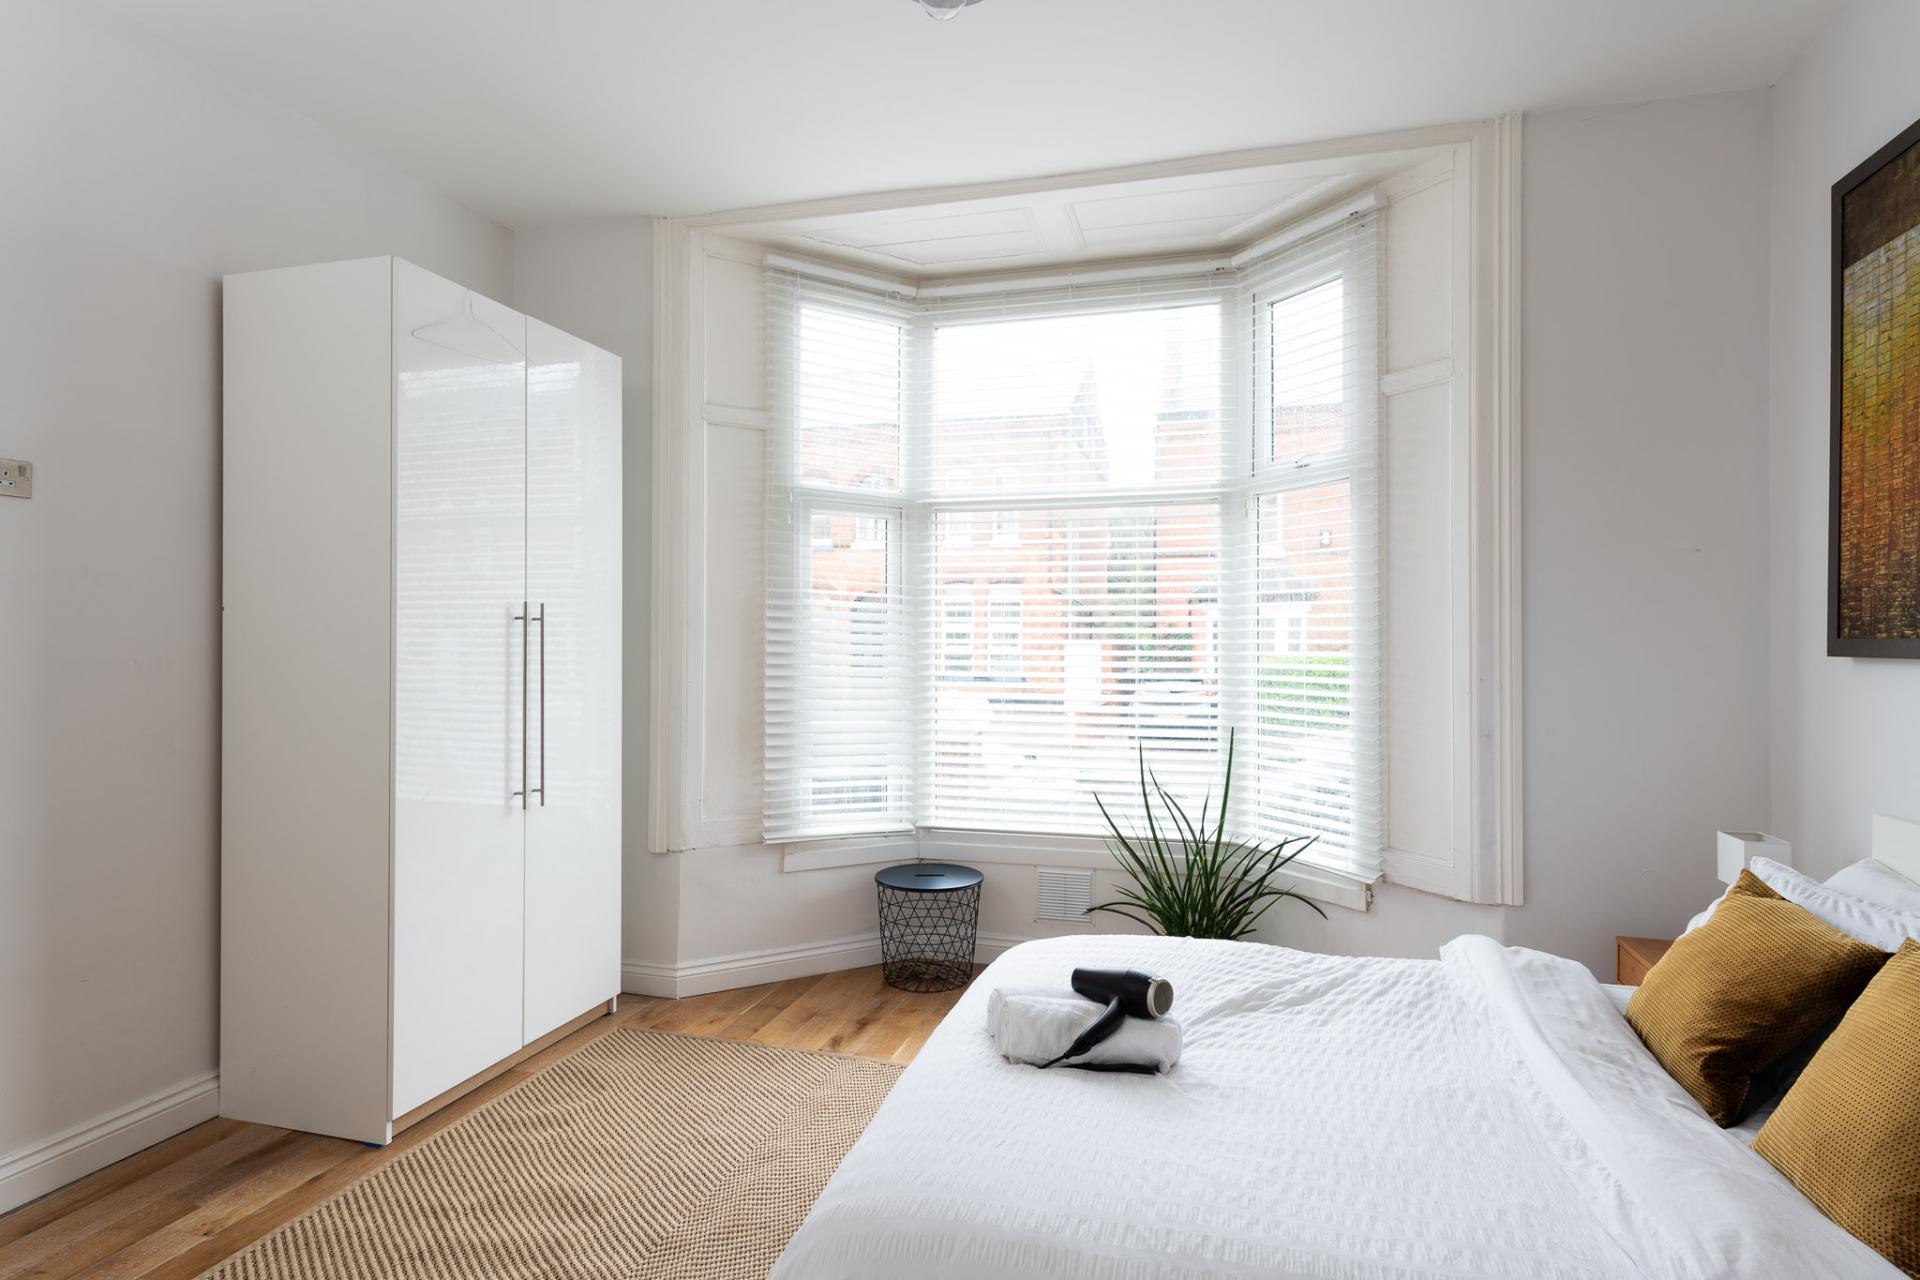 Wardrobe at Edgbaston Apartments, Rotton Park, Birmingham - Citybase Apartments